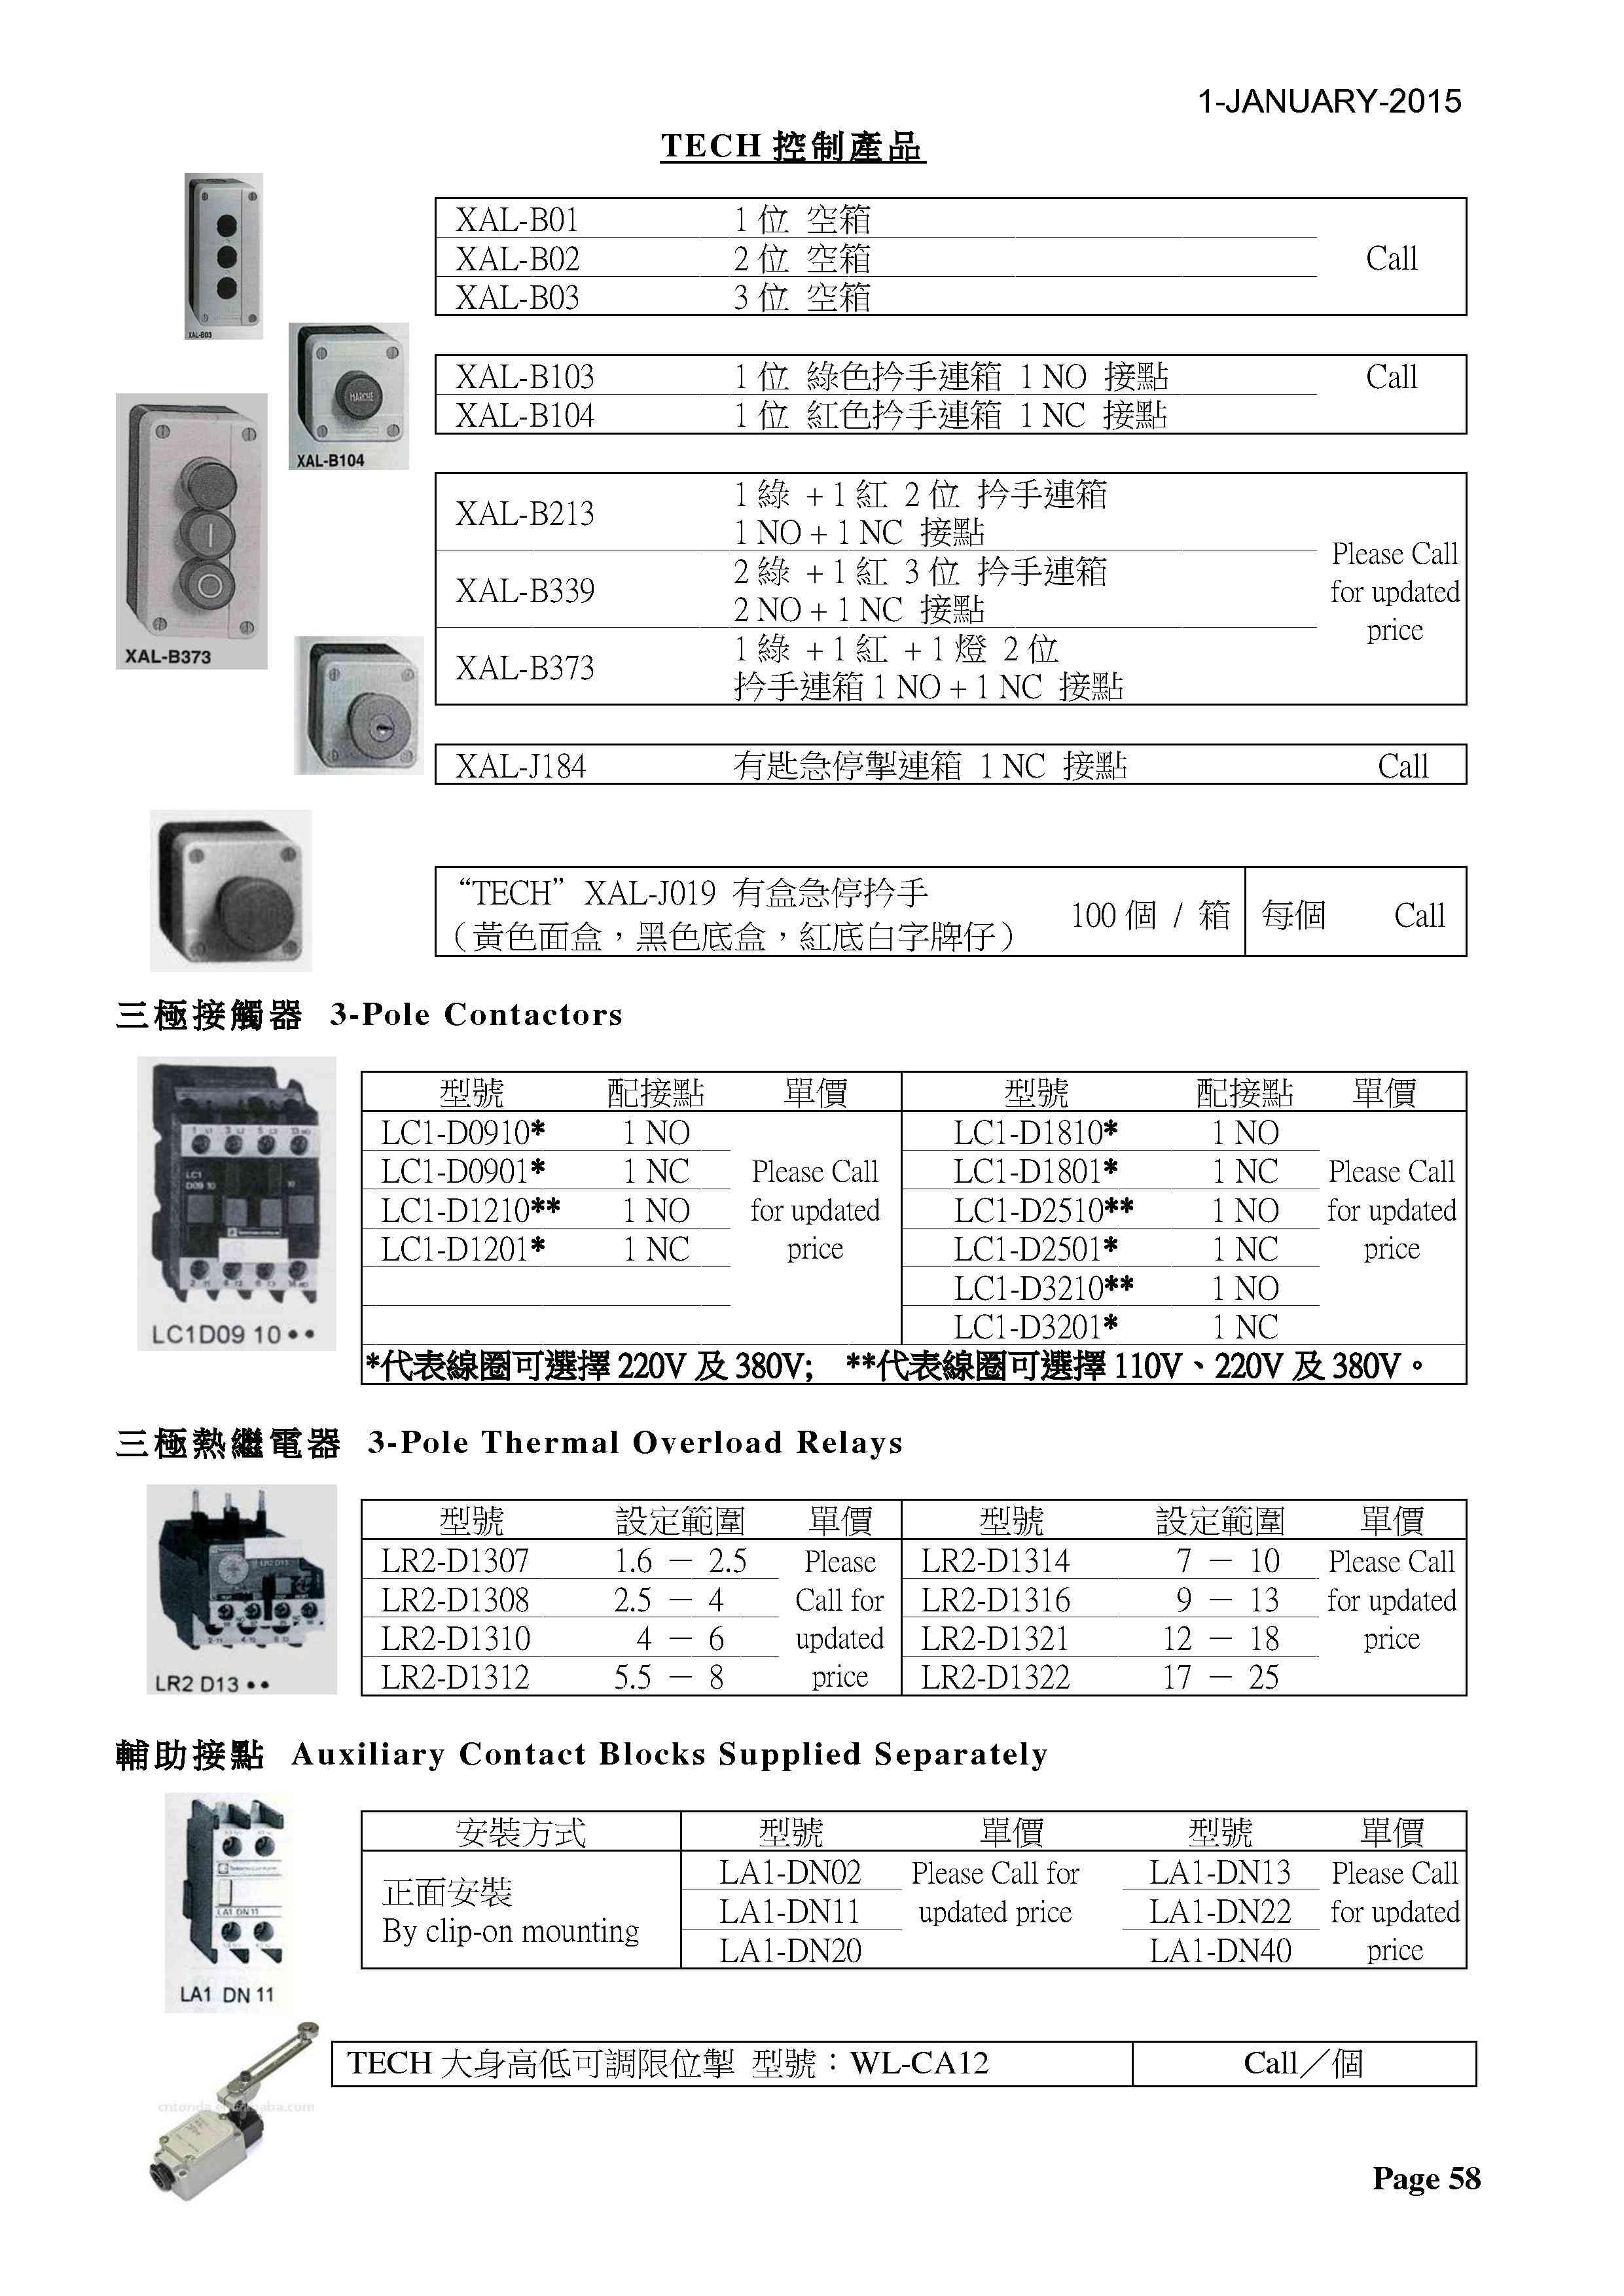 P58 - TECH:控制產品1